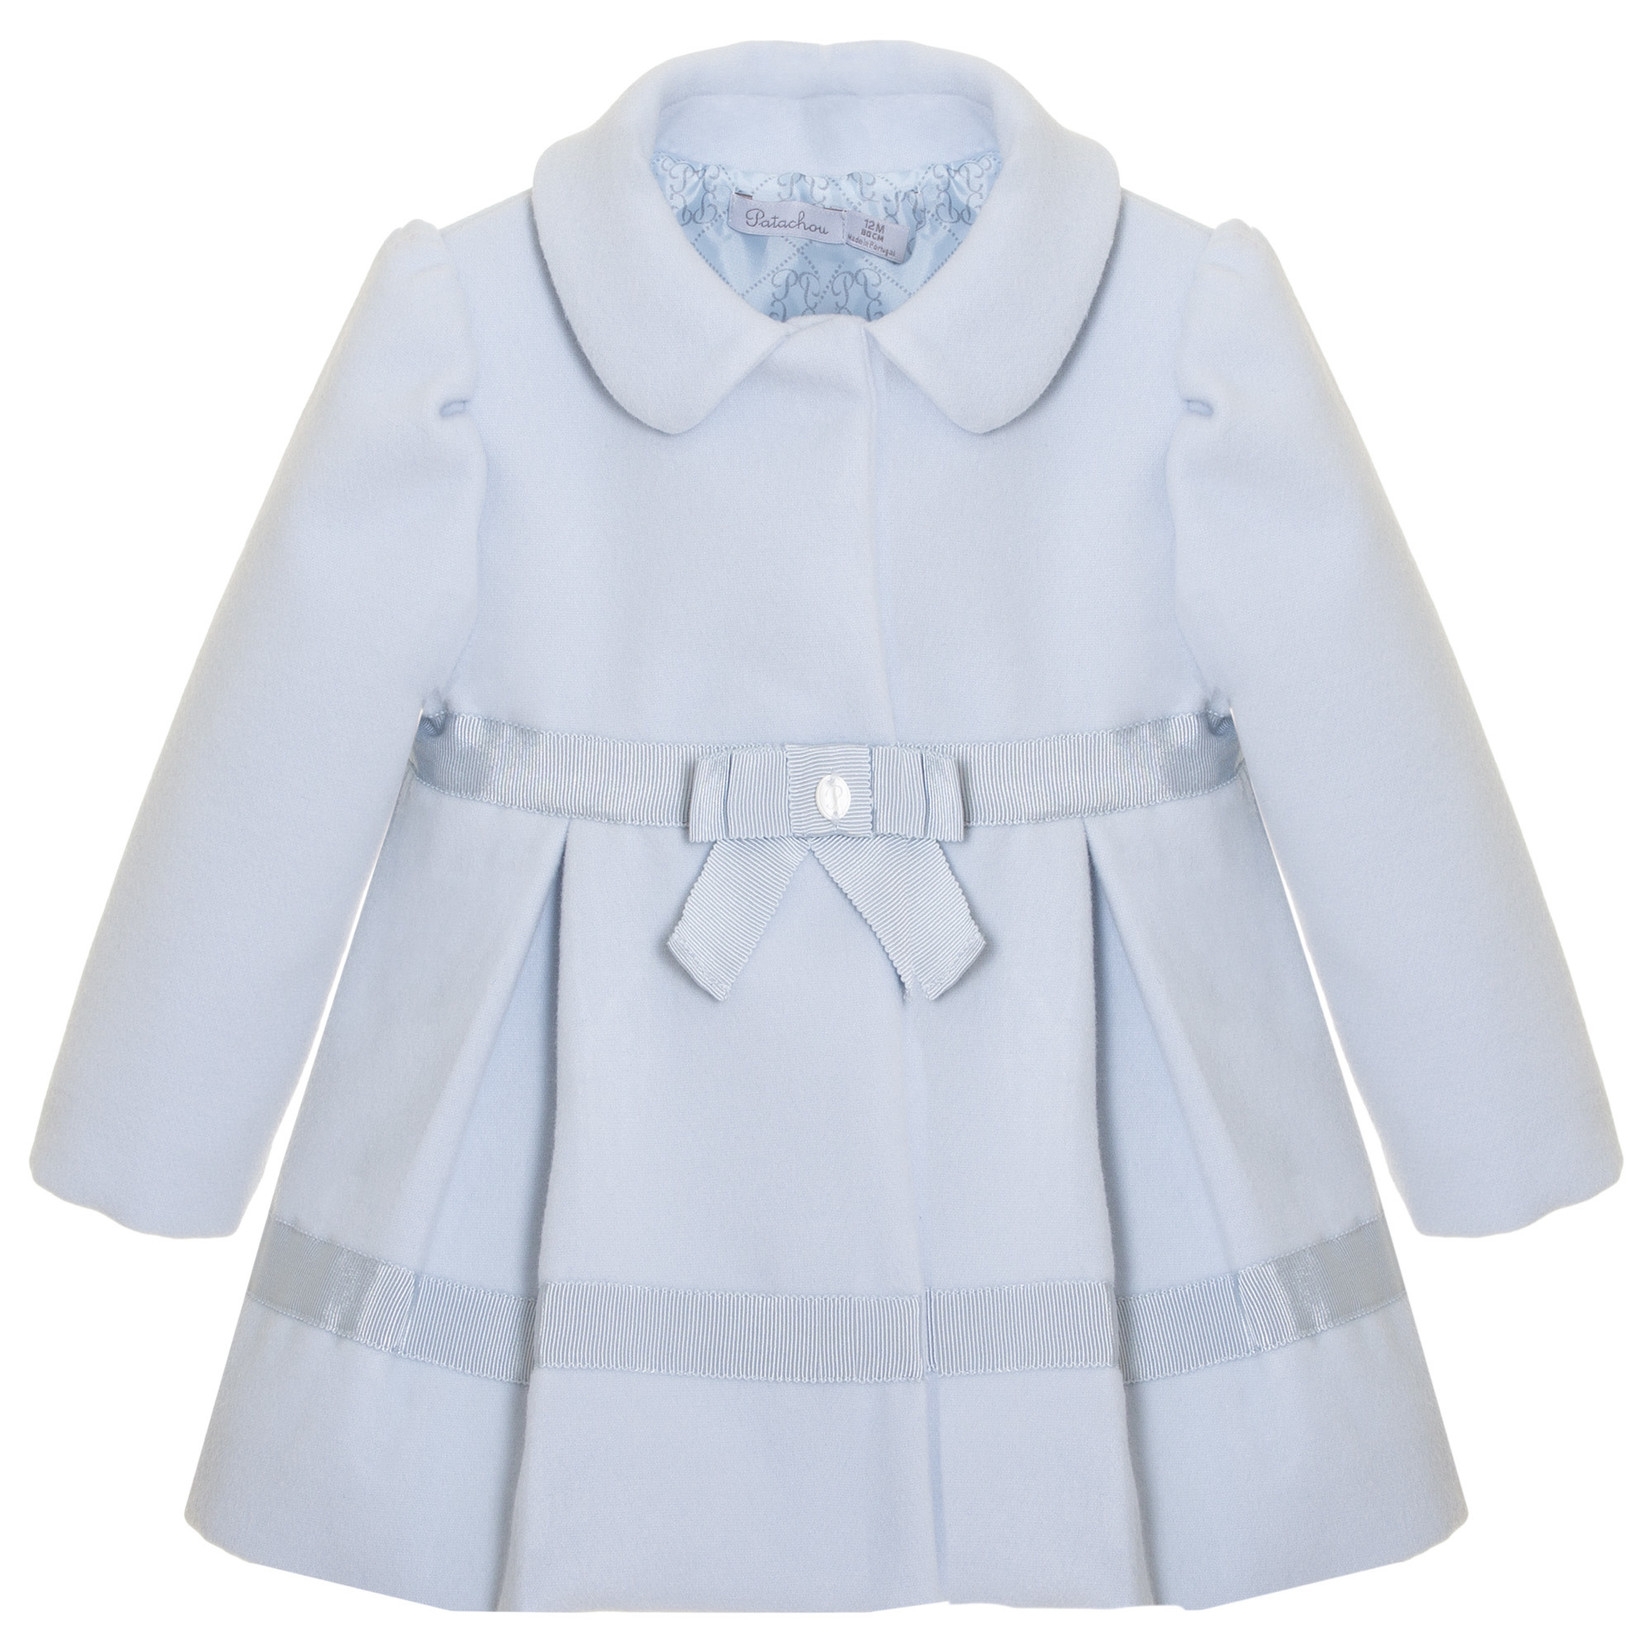 Patachou Jacket Baby Blue - Patachou